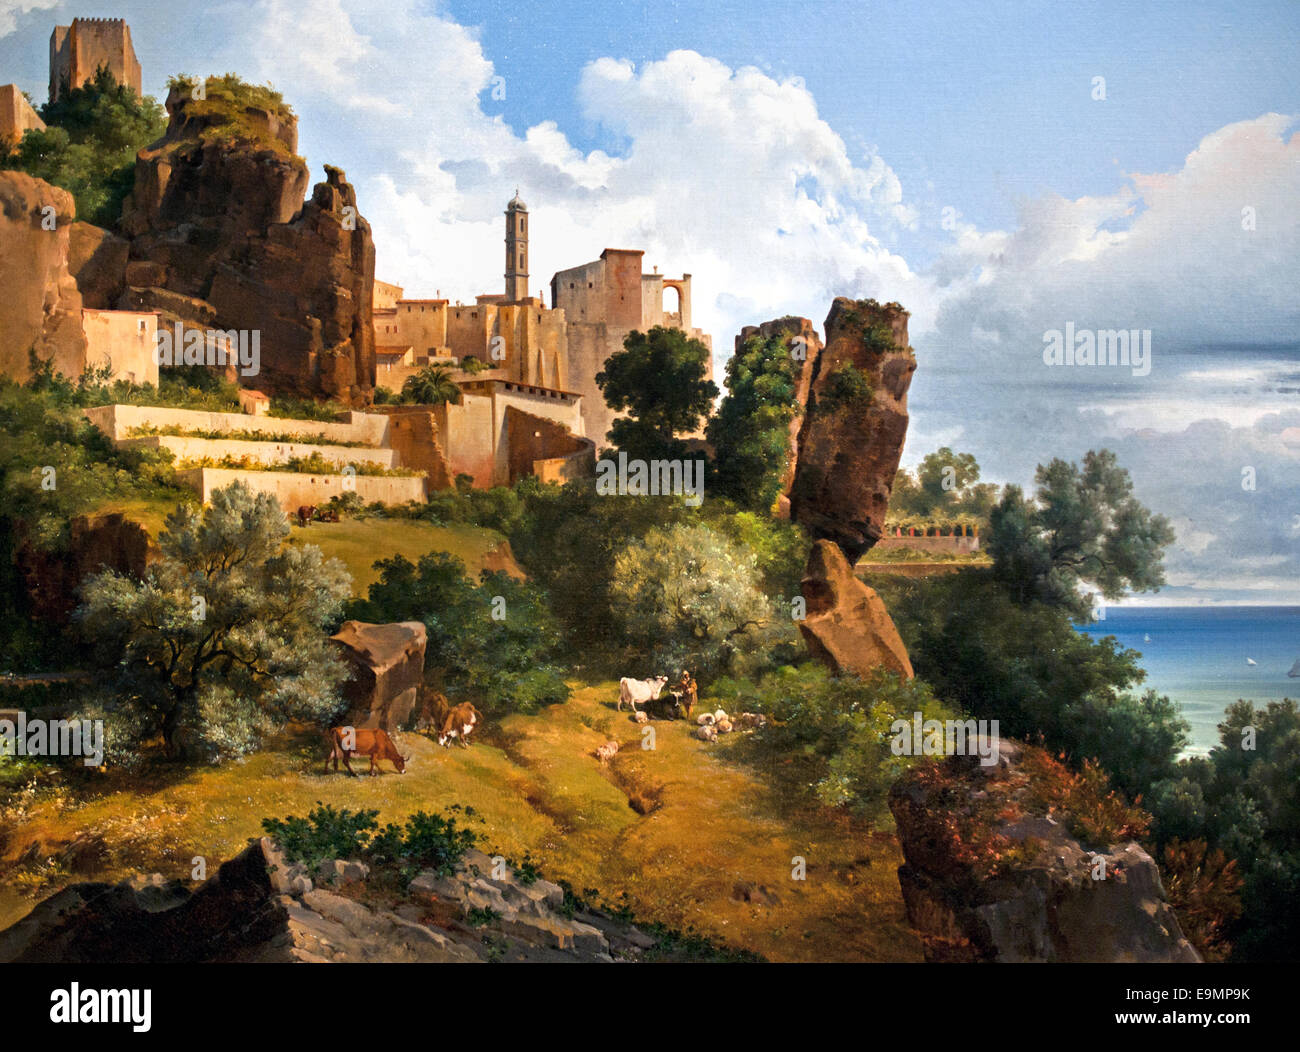 Vue prise de Roquebrune en Italie -  View from Roquebrune Italy 183 Lancelot Théodore Turpin de Crissé - Stock Image